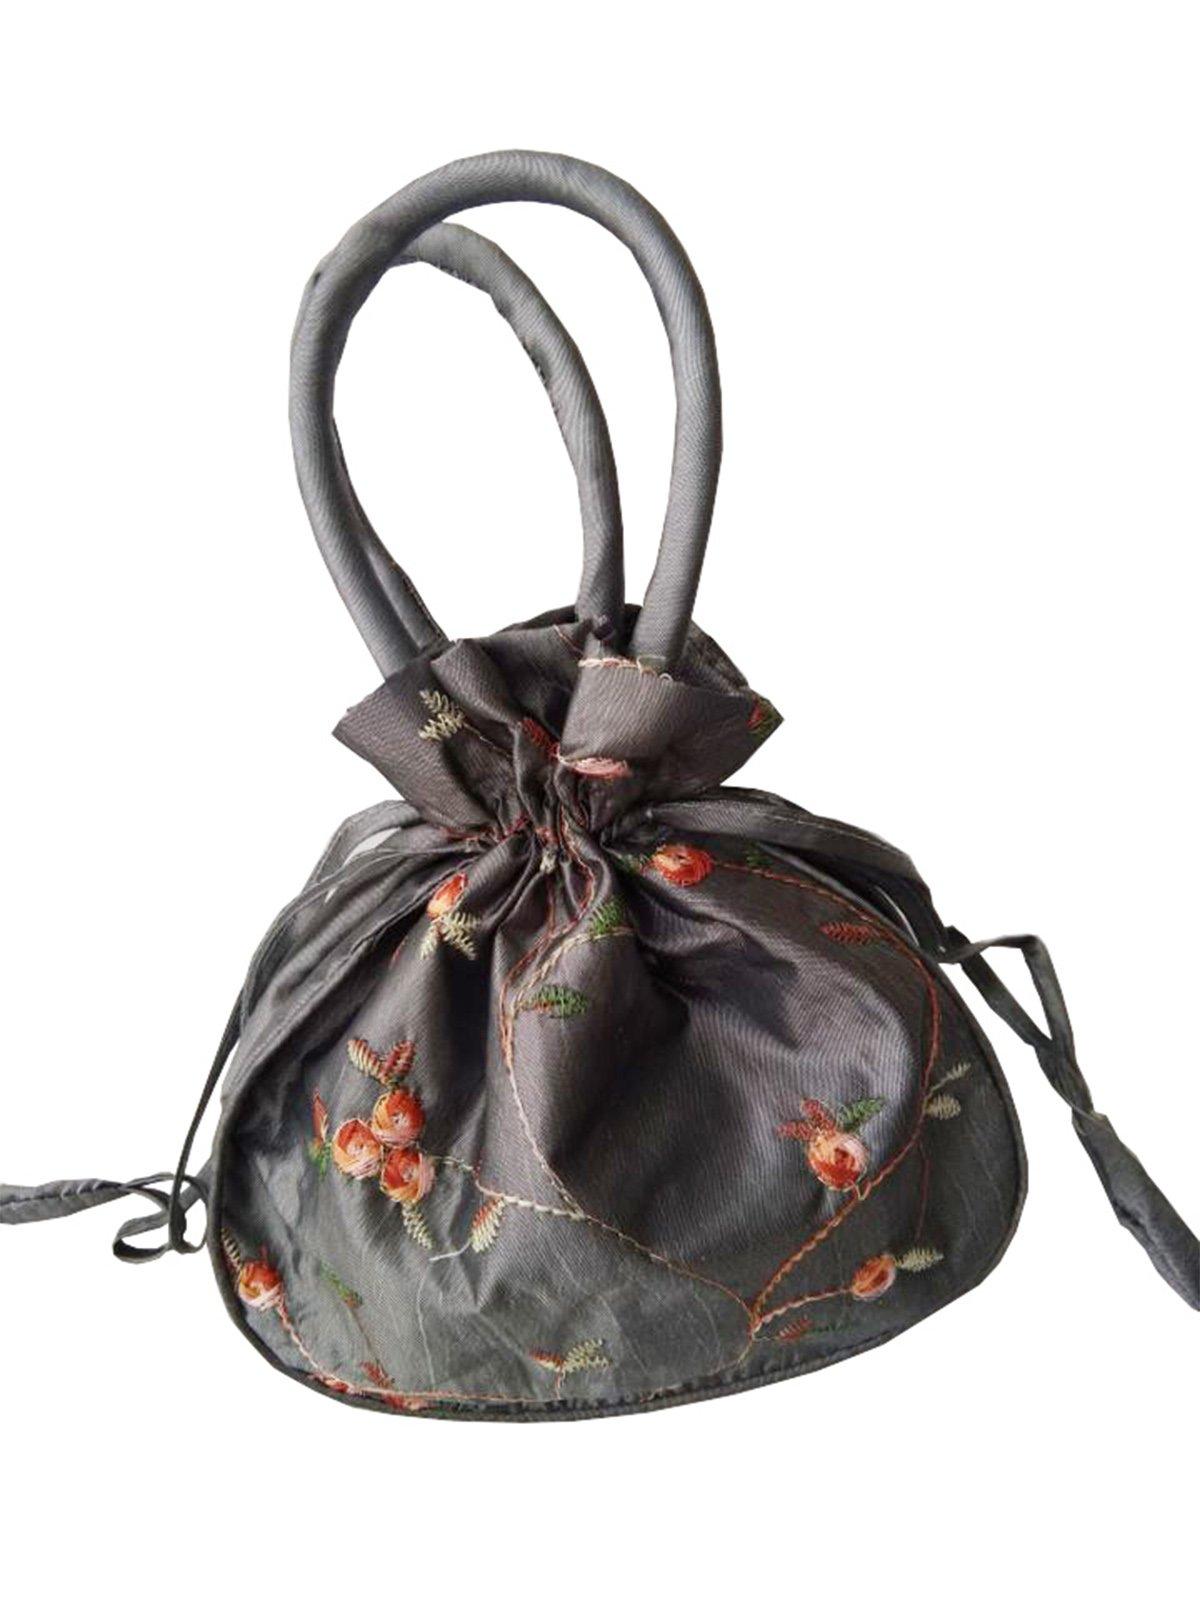 YuRong Taffeta Wedding Bag for bridal Embroidery Pouches Wedding Accessories B01 (Silver)